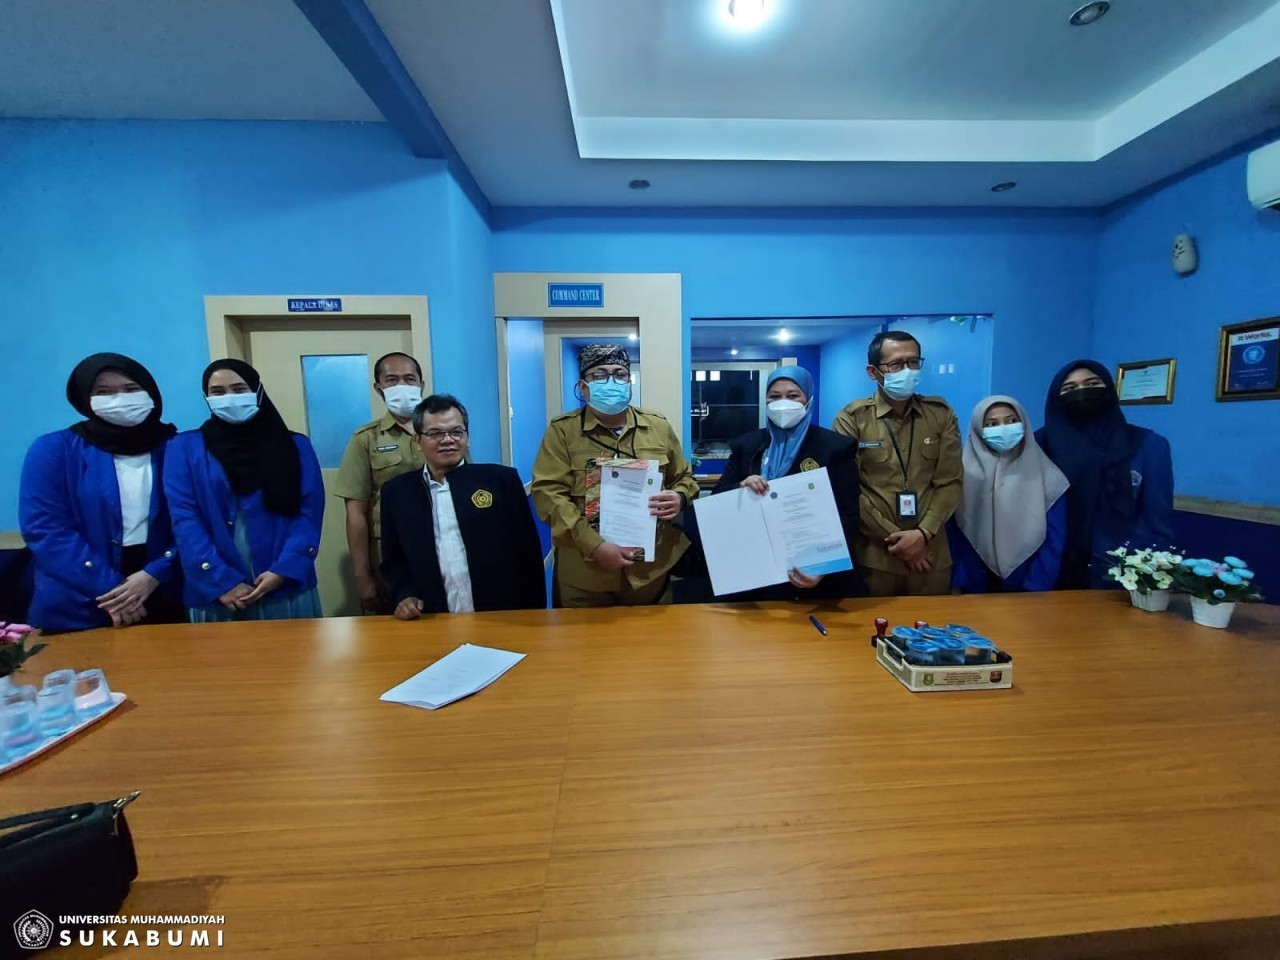 Kerja Sama UMMI dengan Diskominfo Kota Sukabumi melalui Program MBKM